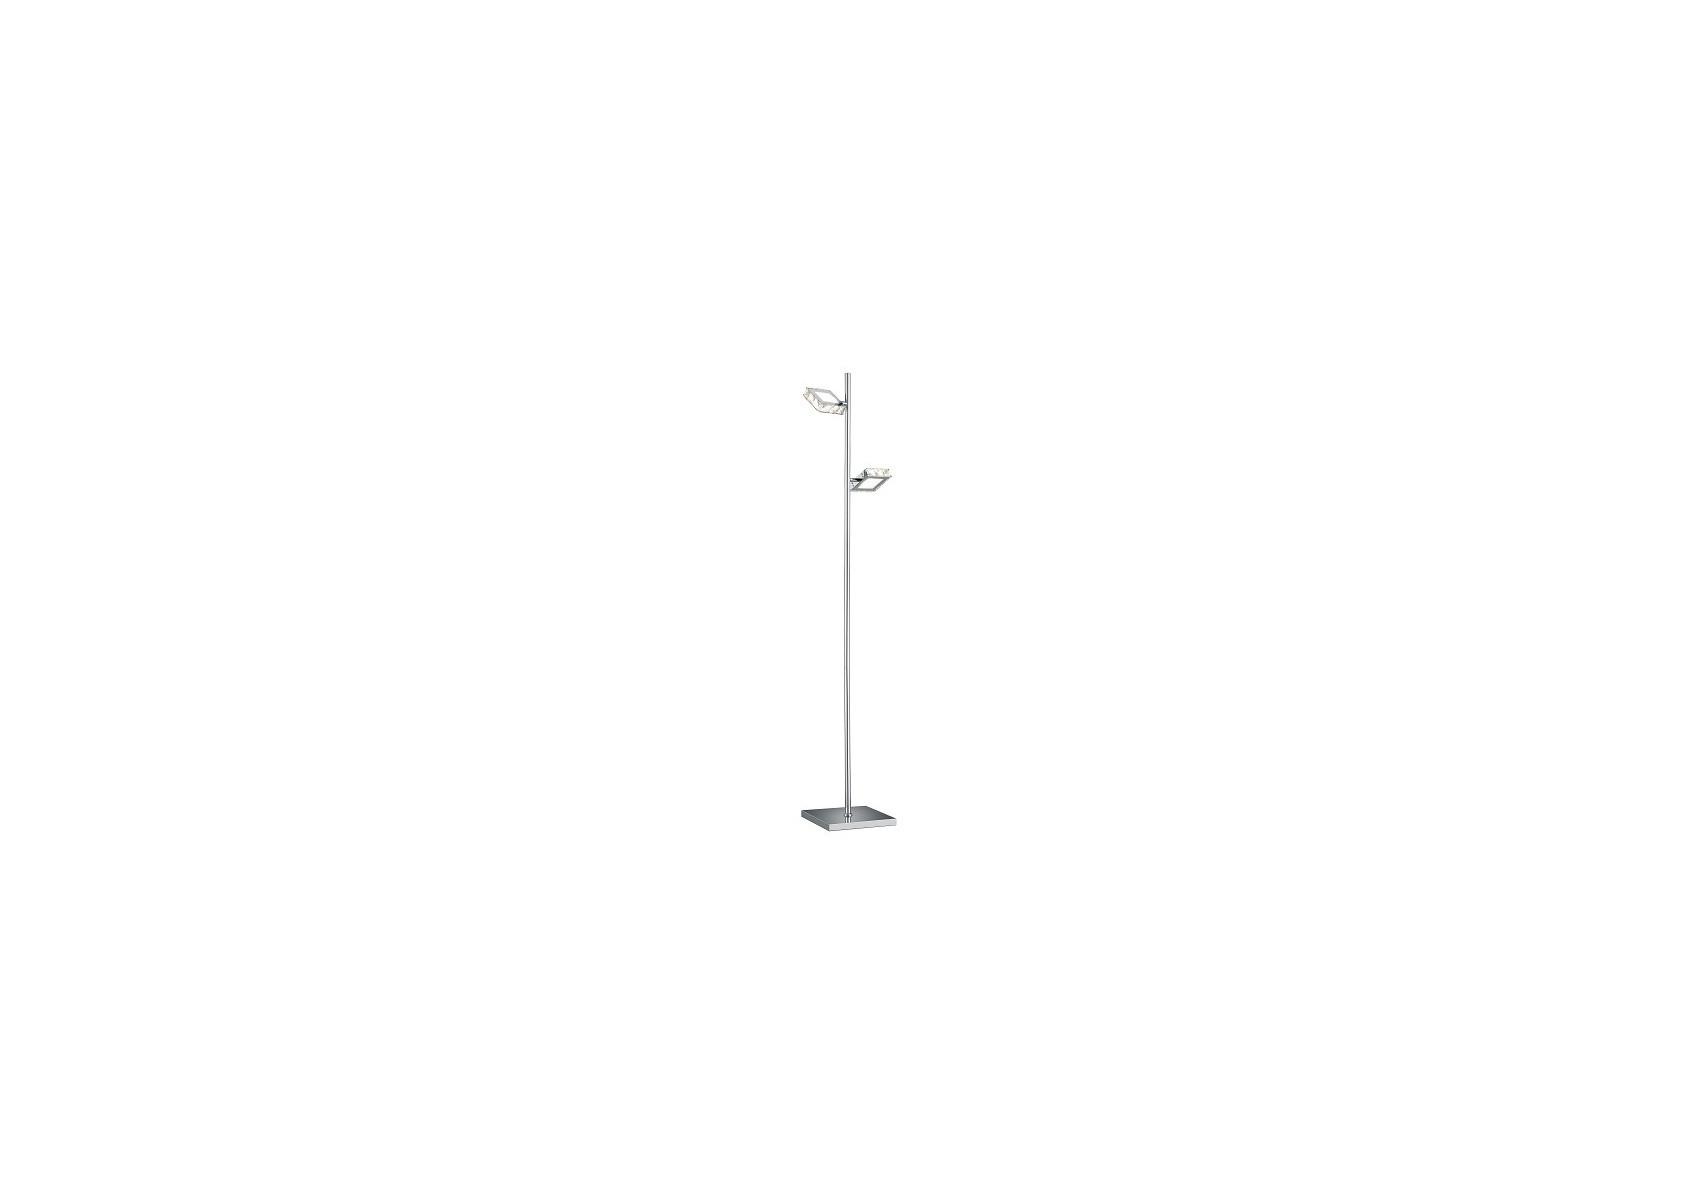 lampadaire led design grenoble 2 lampes boite design. Black Bedroom Furniture Sets. Home Design Ideas